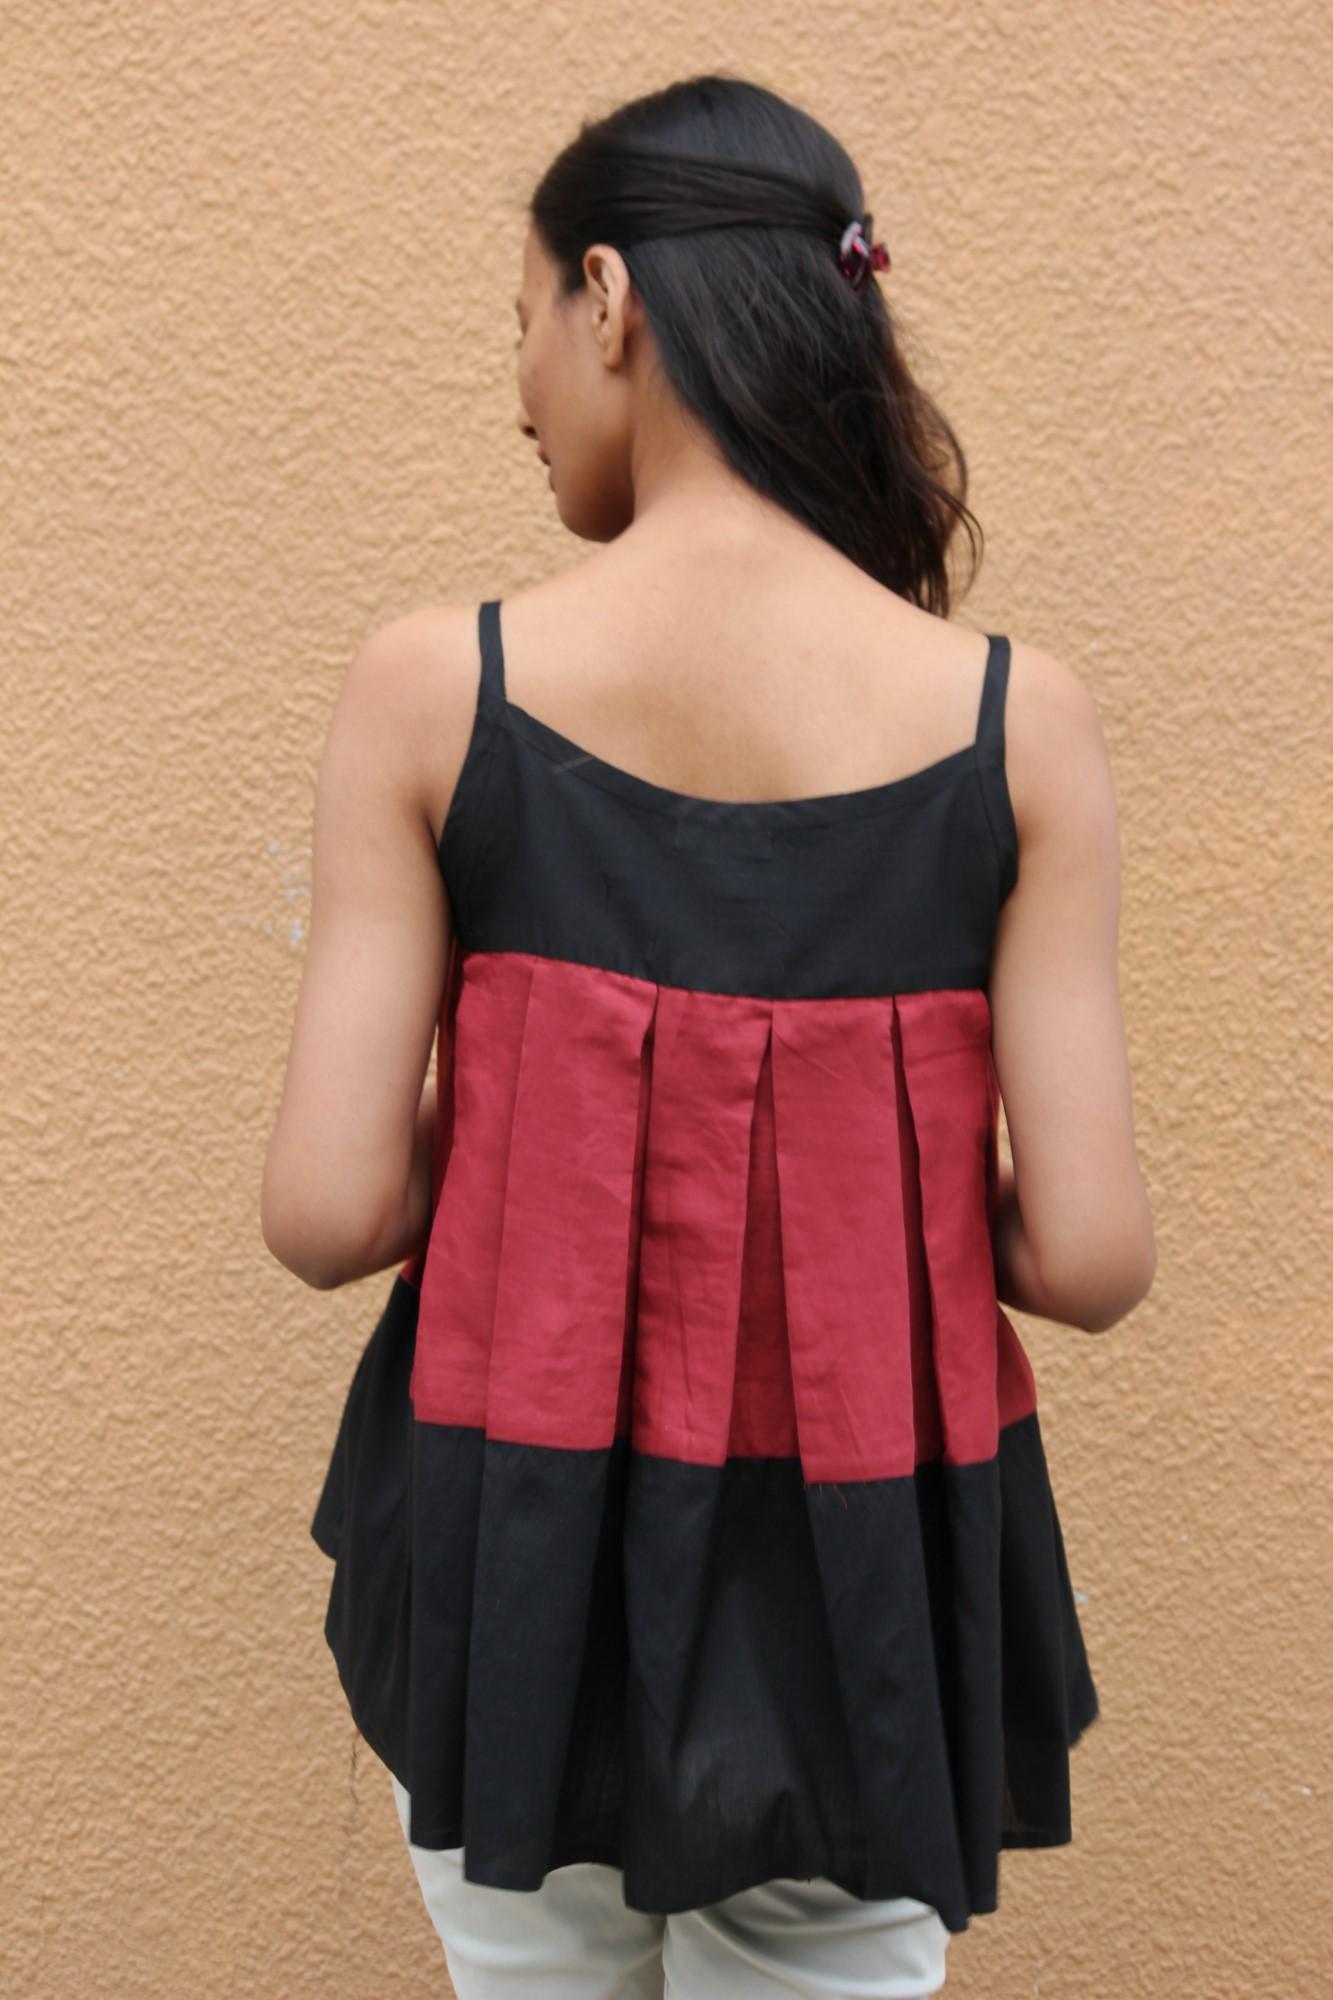 Stripey Cotton Top By TAMASQ